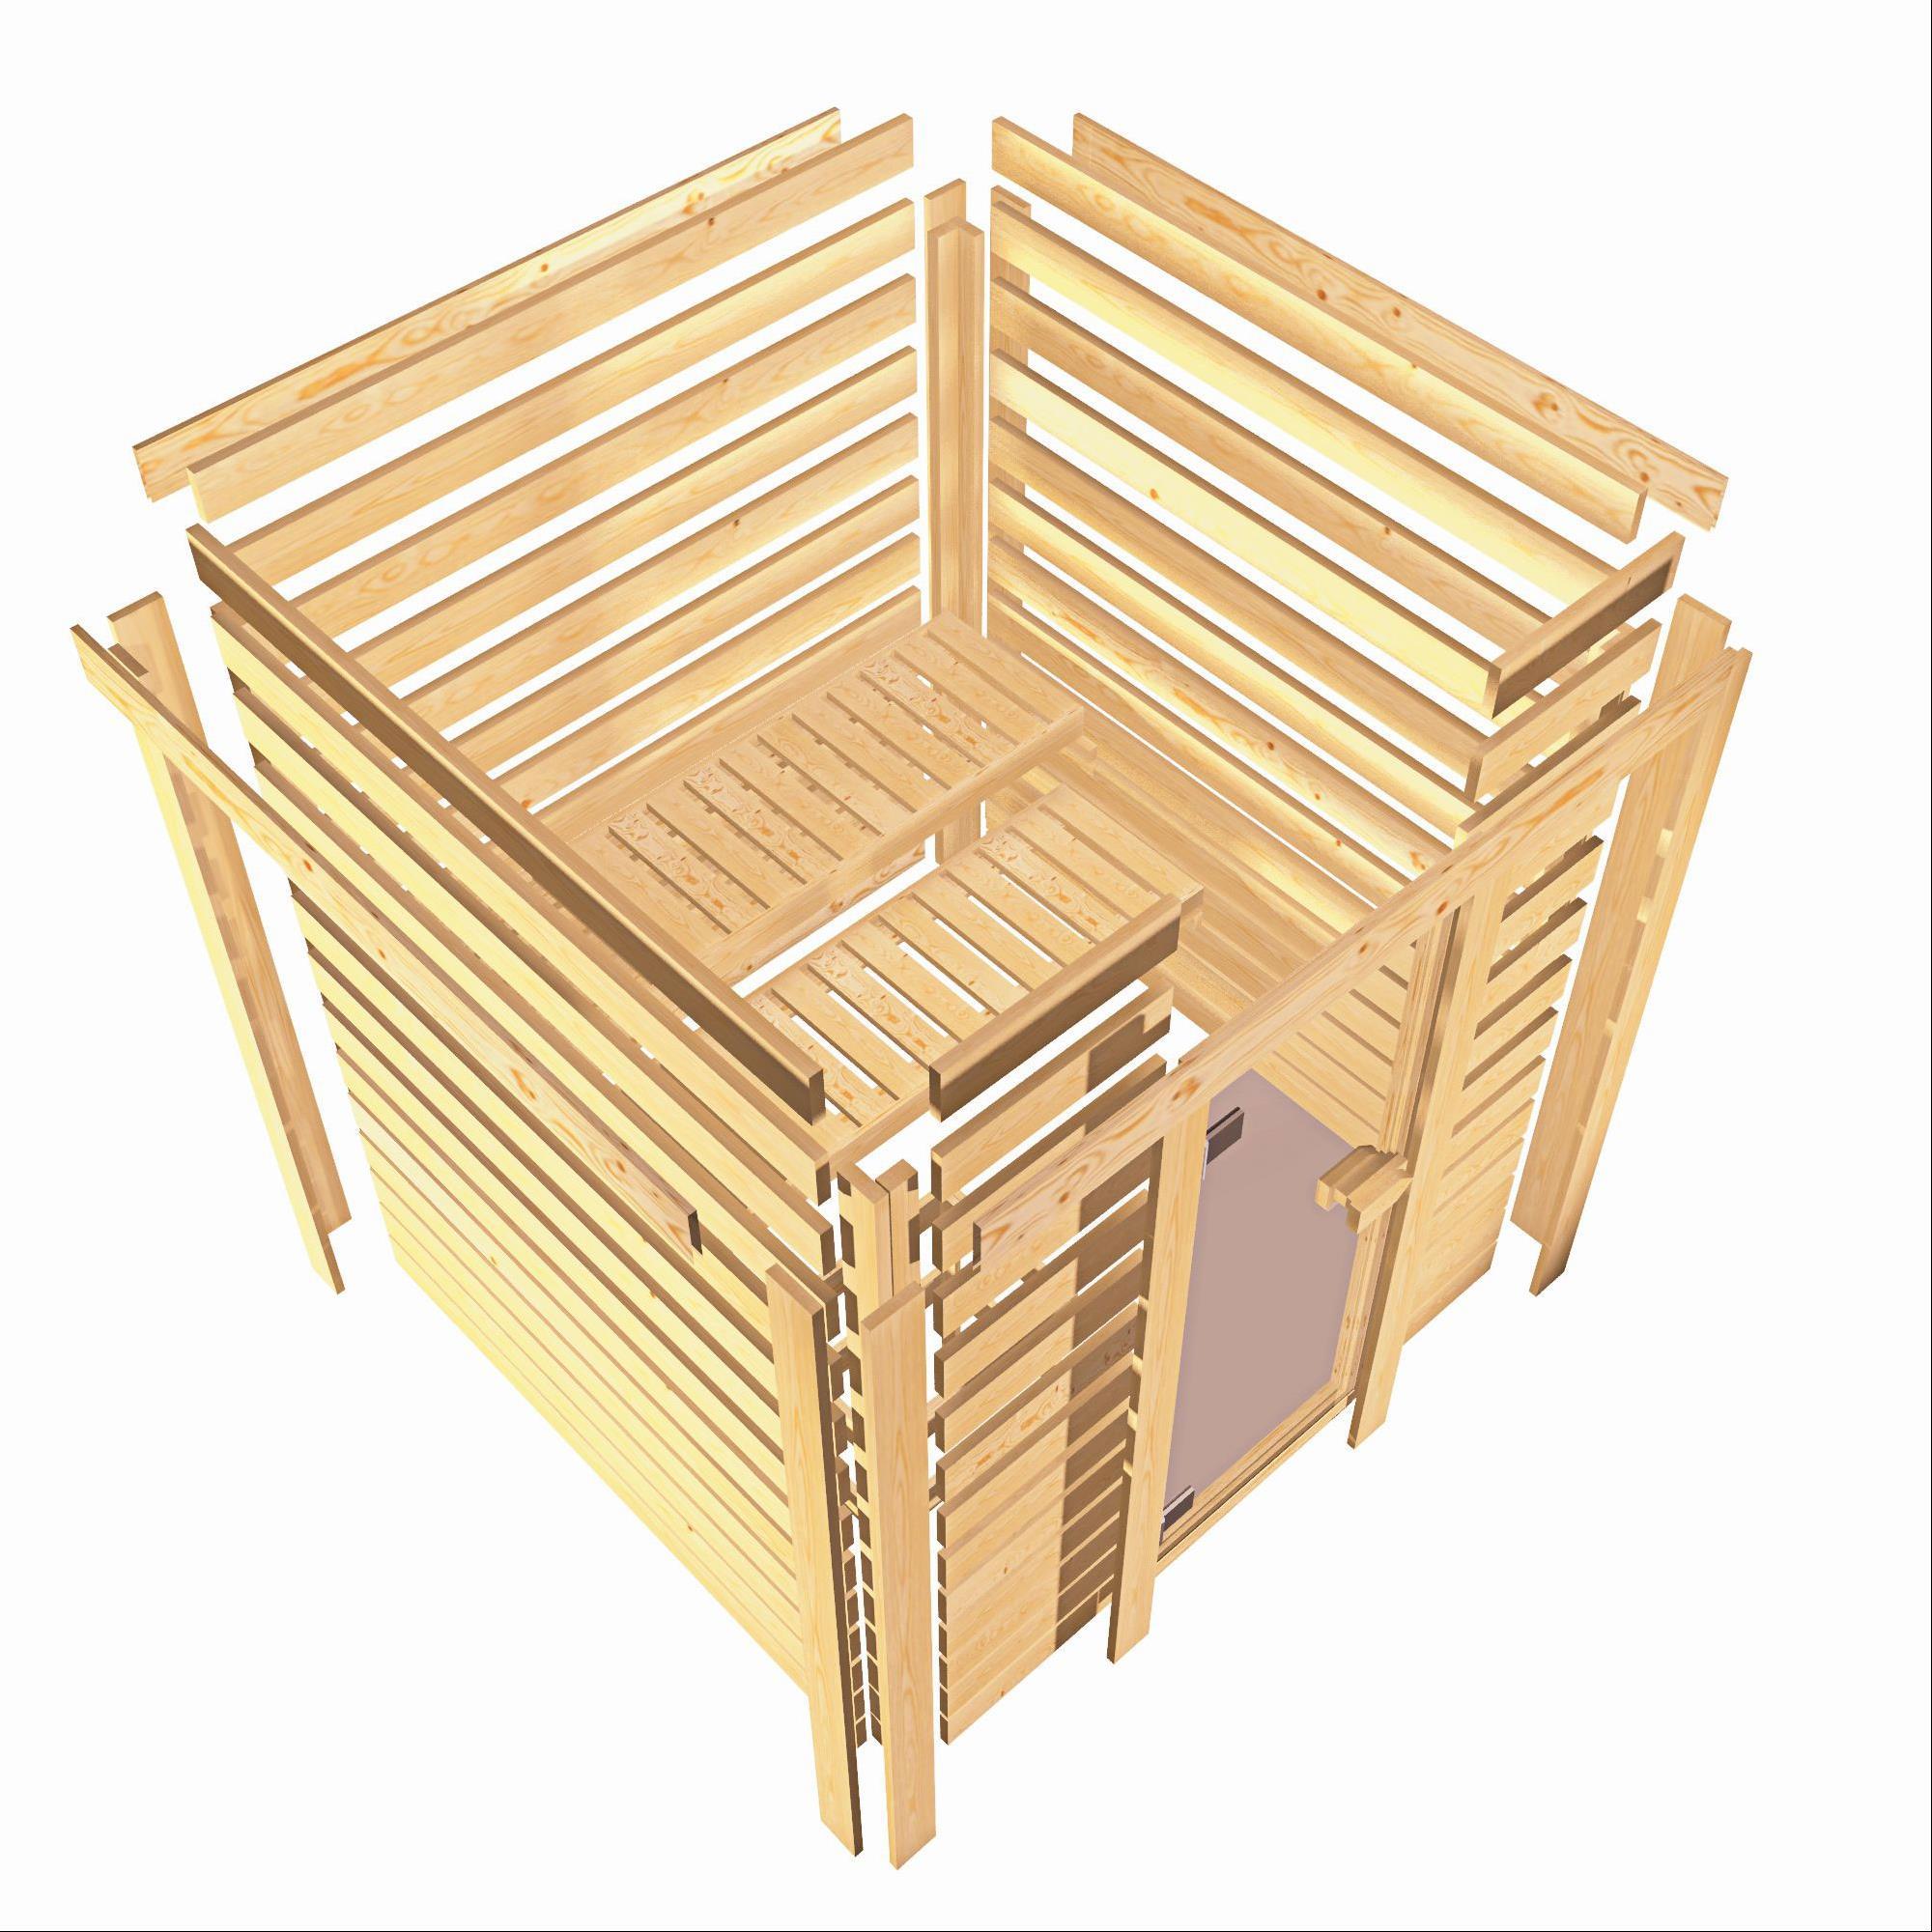 Woodfeeling Sauna Leona 38mm Ofen 9kW extern Tür Holz Bild 4